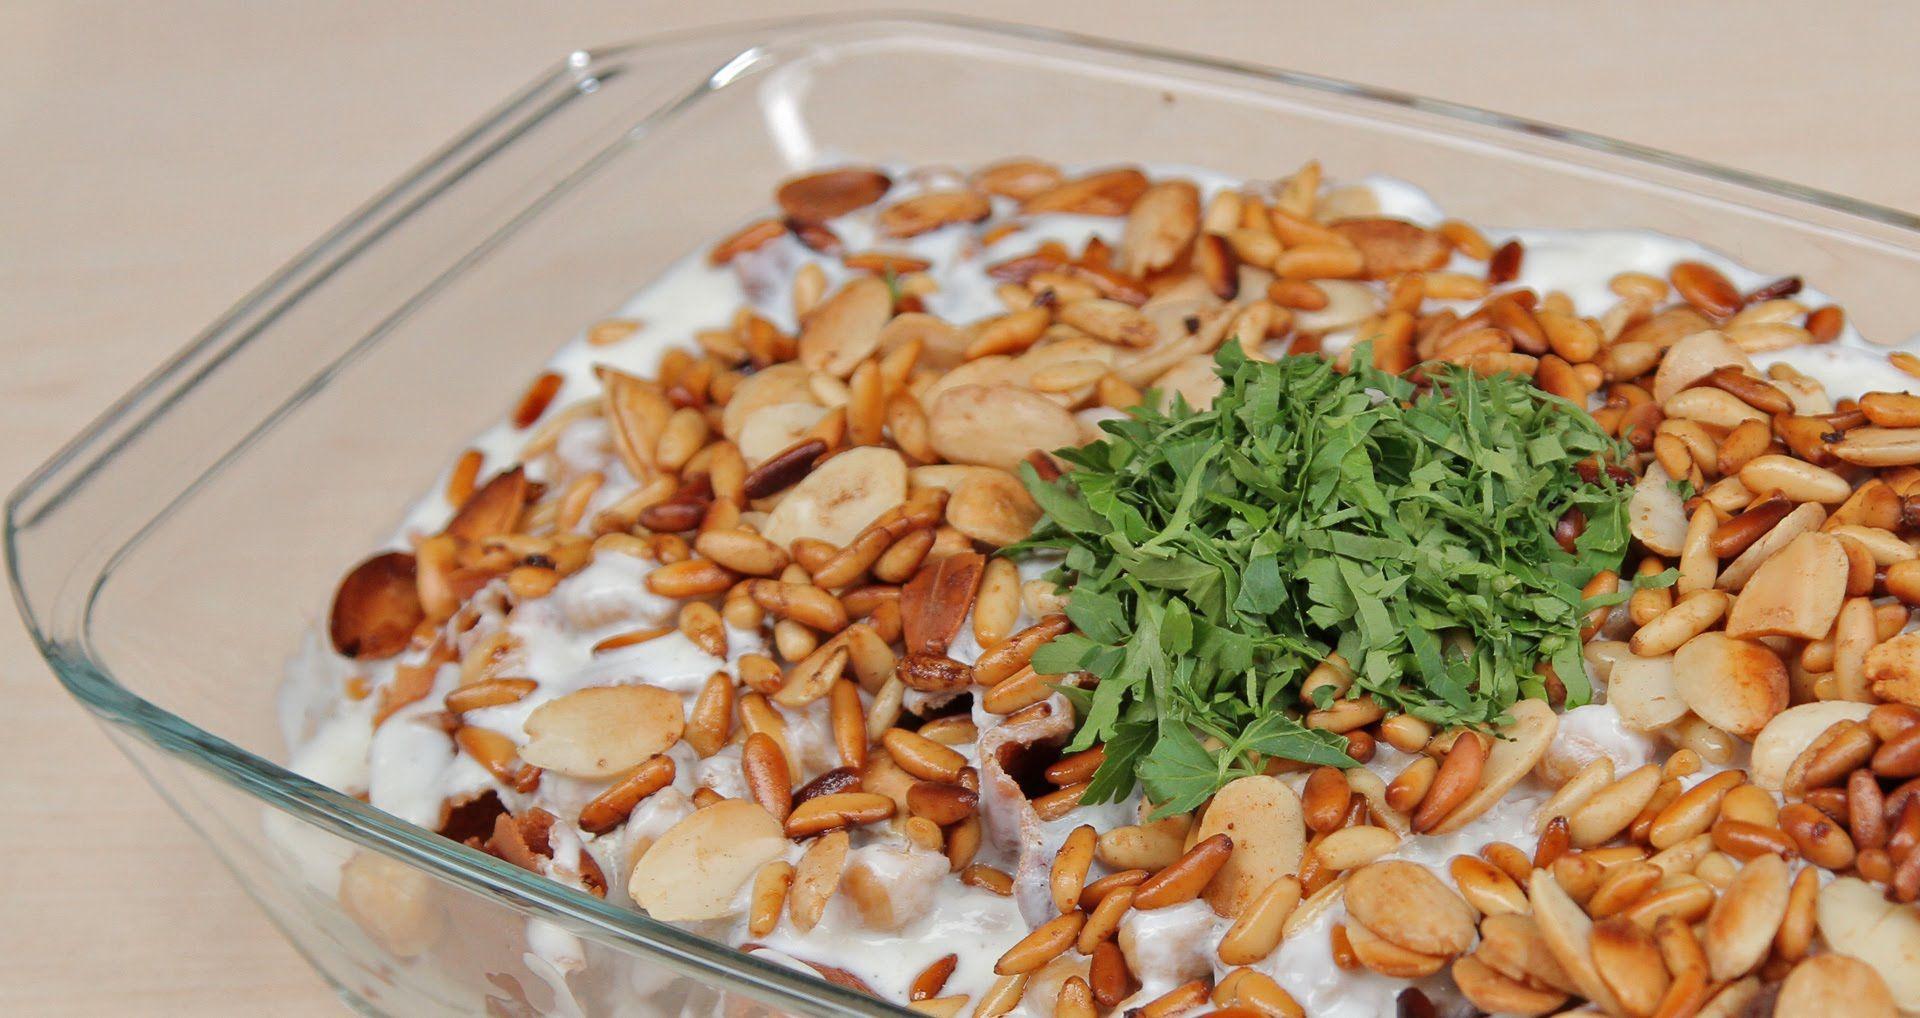 فتة الباذنجان بالزبادي Middle Eastern Recipes Couscous Healthy Recipes